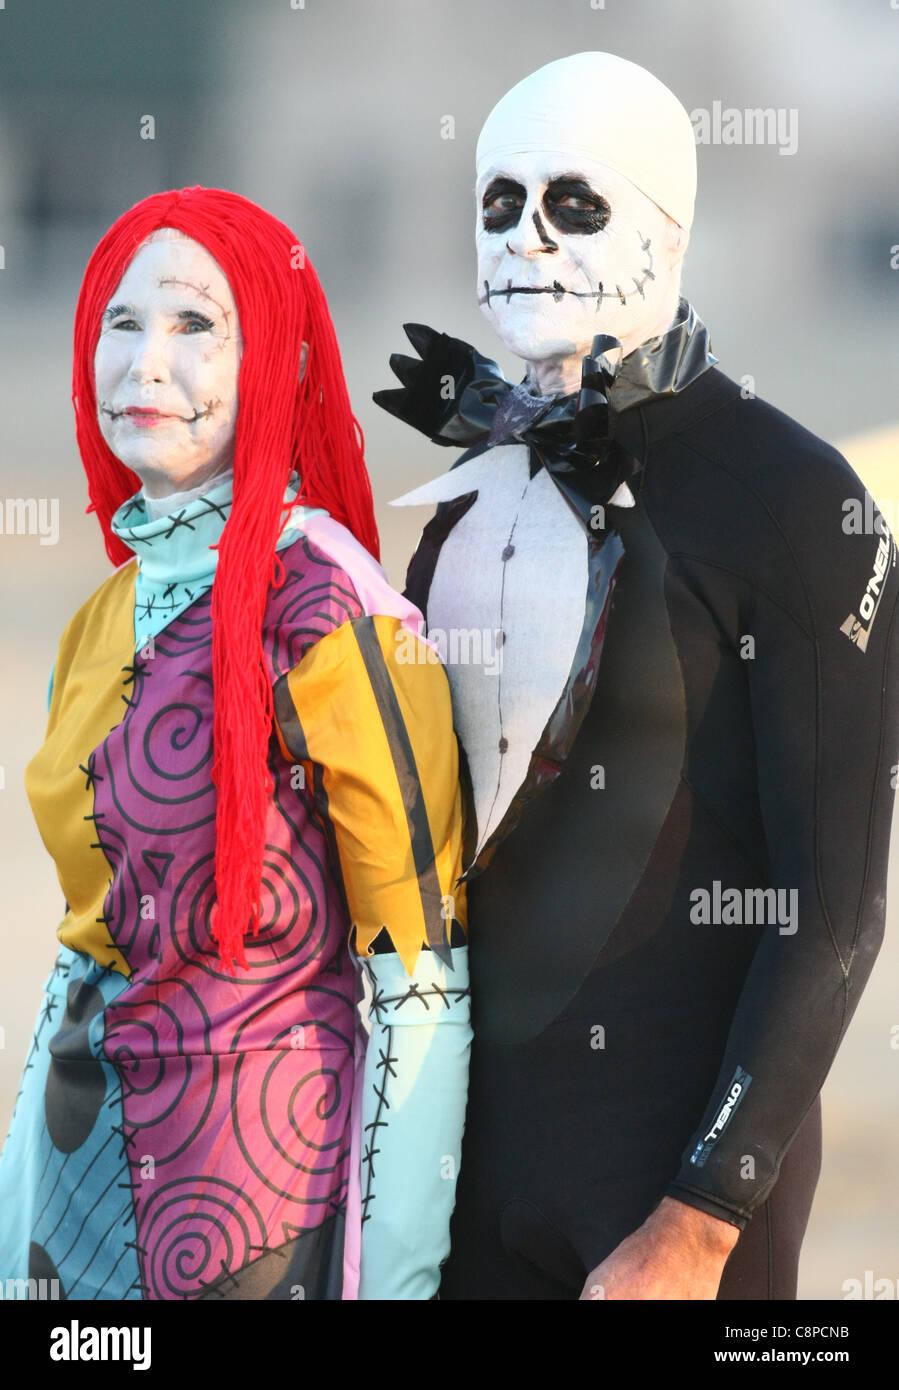 Nightmare Before Christmas Halloween Couple Costumes | www ...